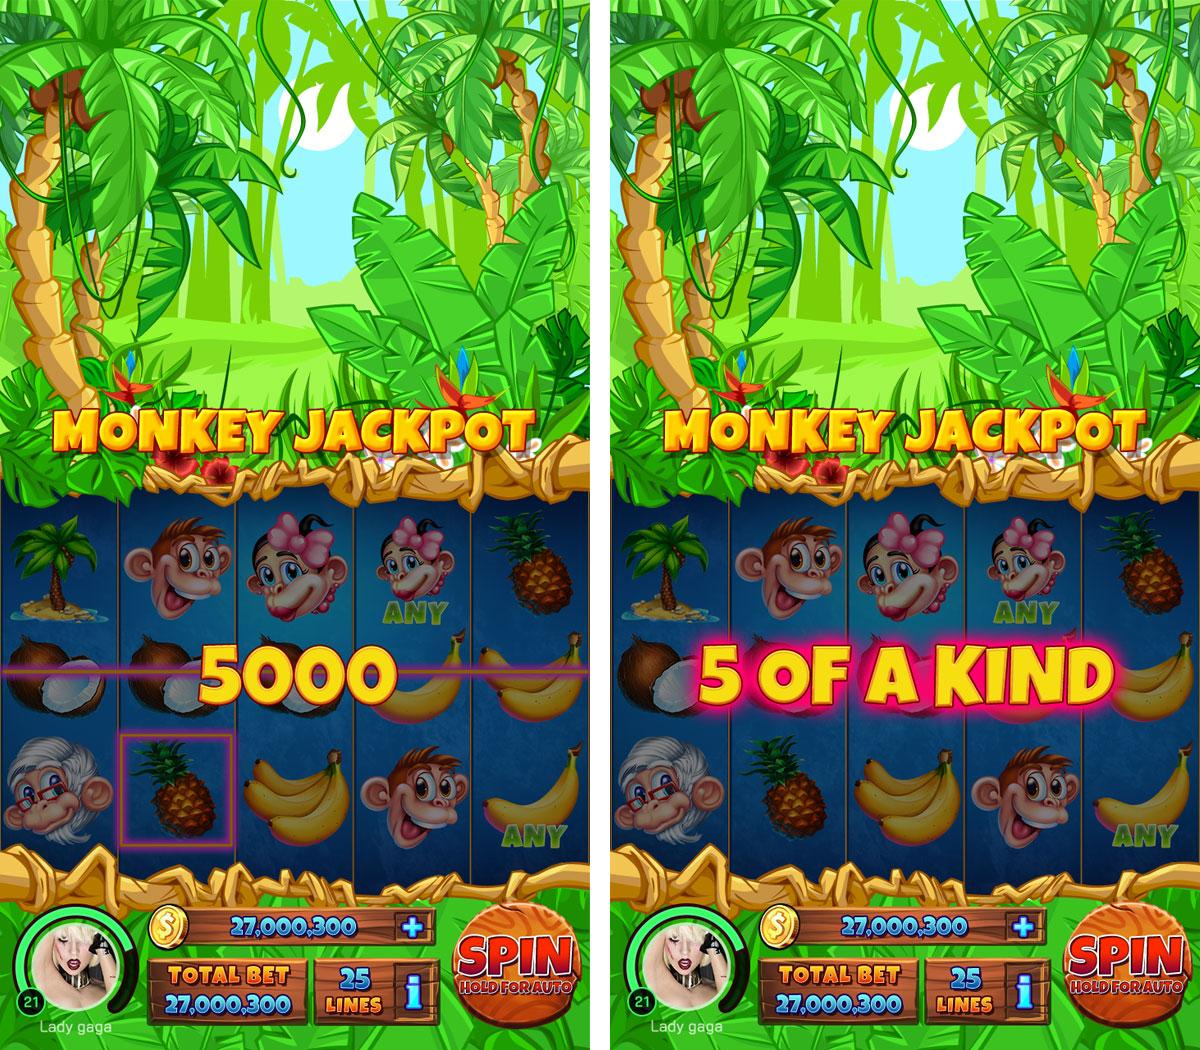 monkey_jackpot_blog_win-1